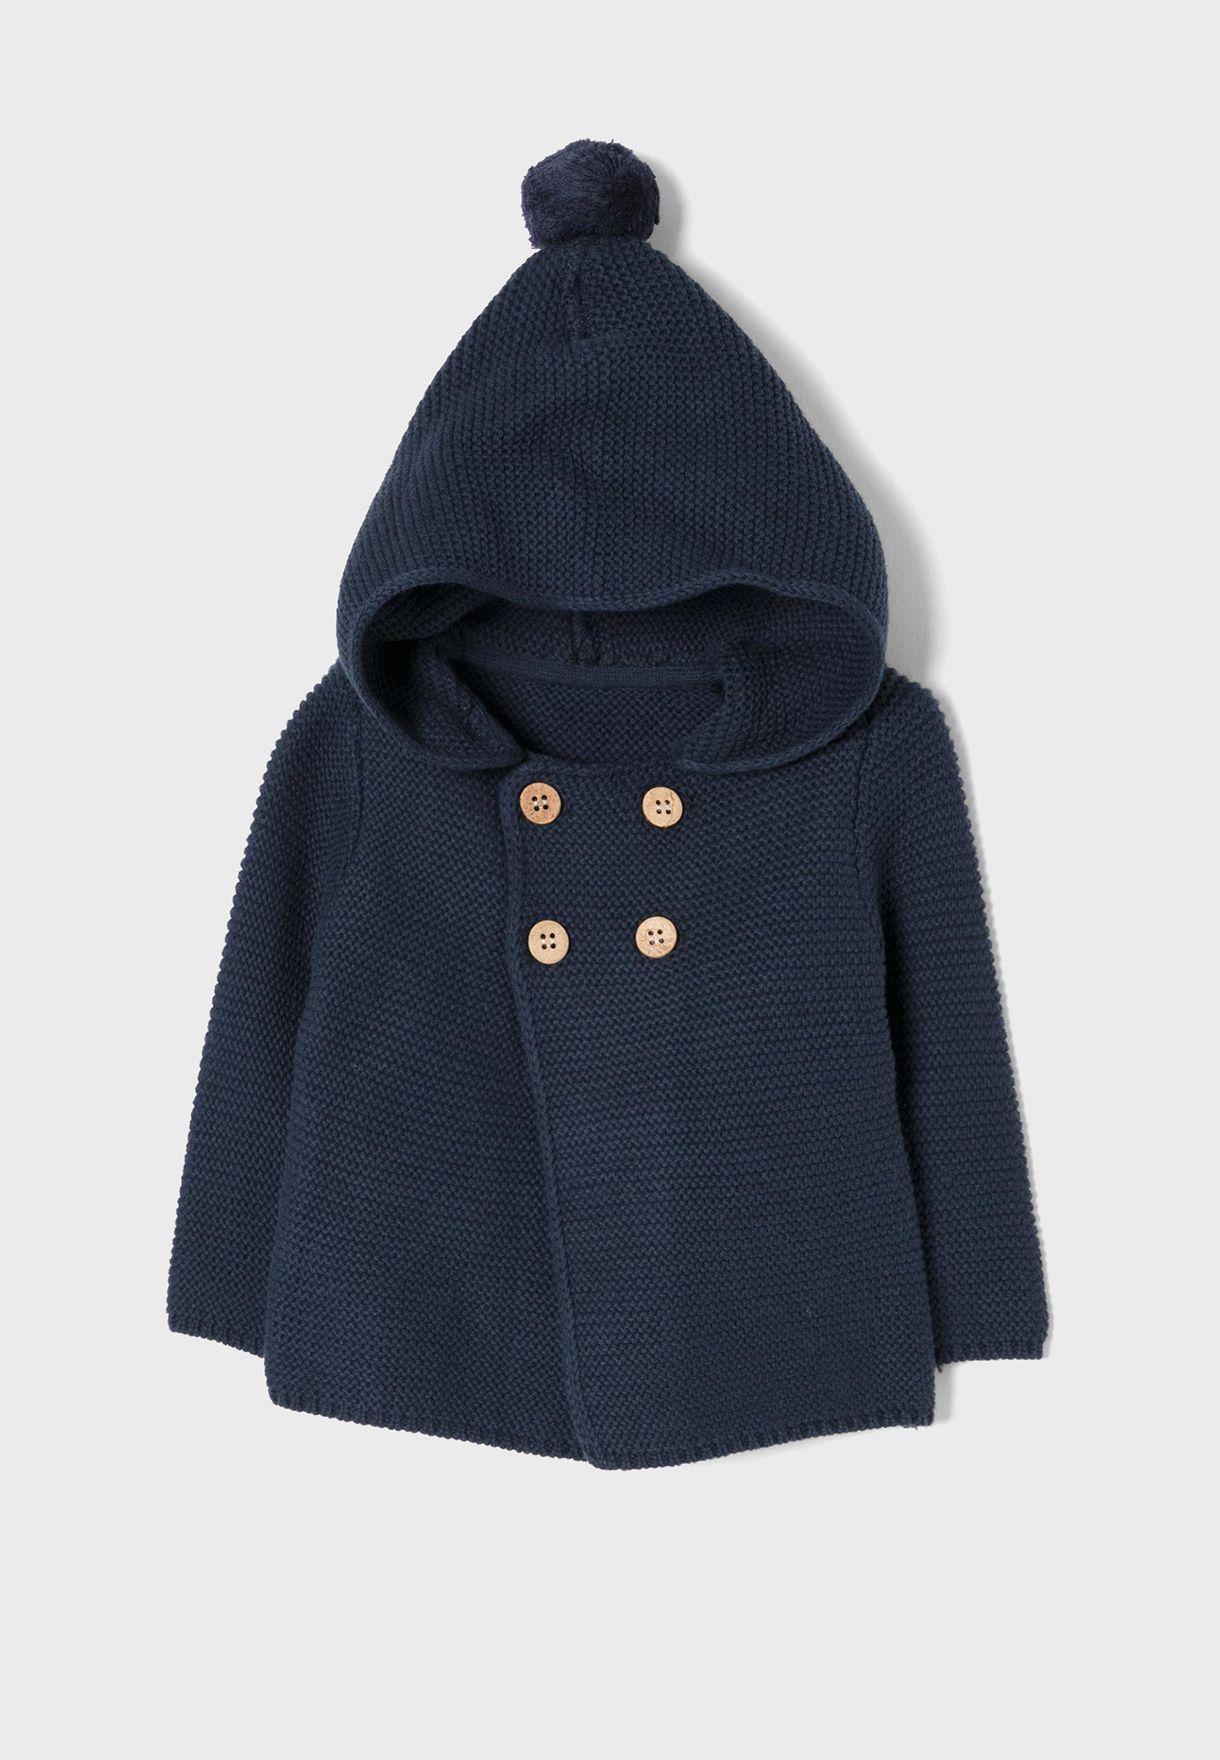 Infant Hooded Cardigan